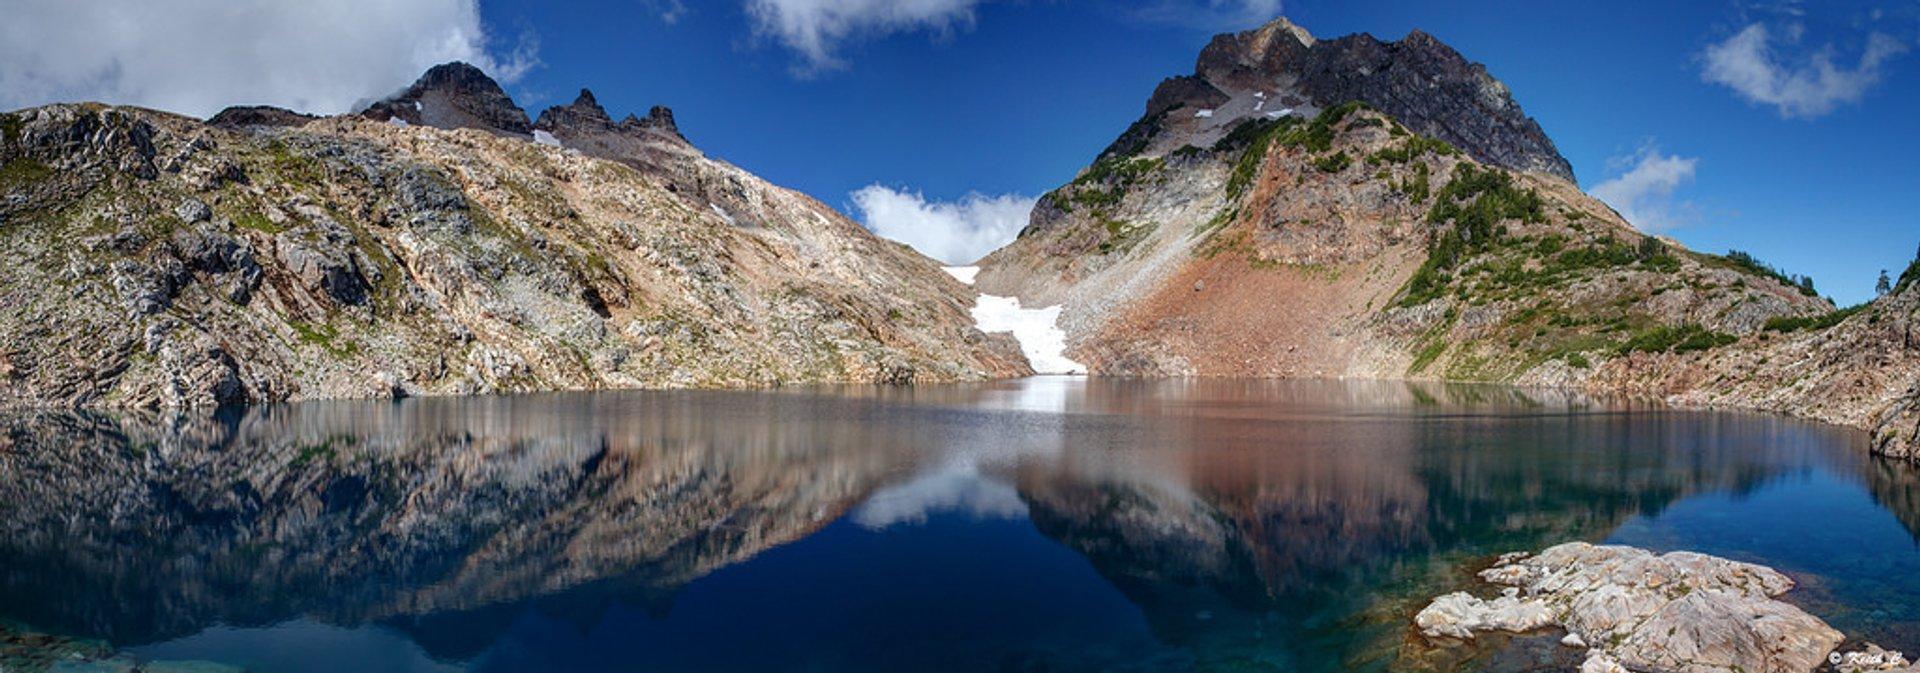 Foggy Lake panorama 2020